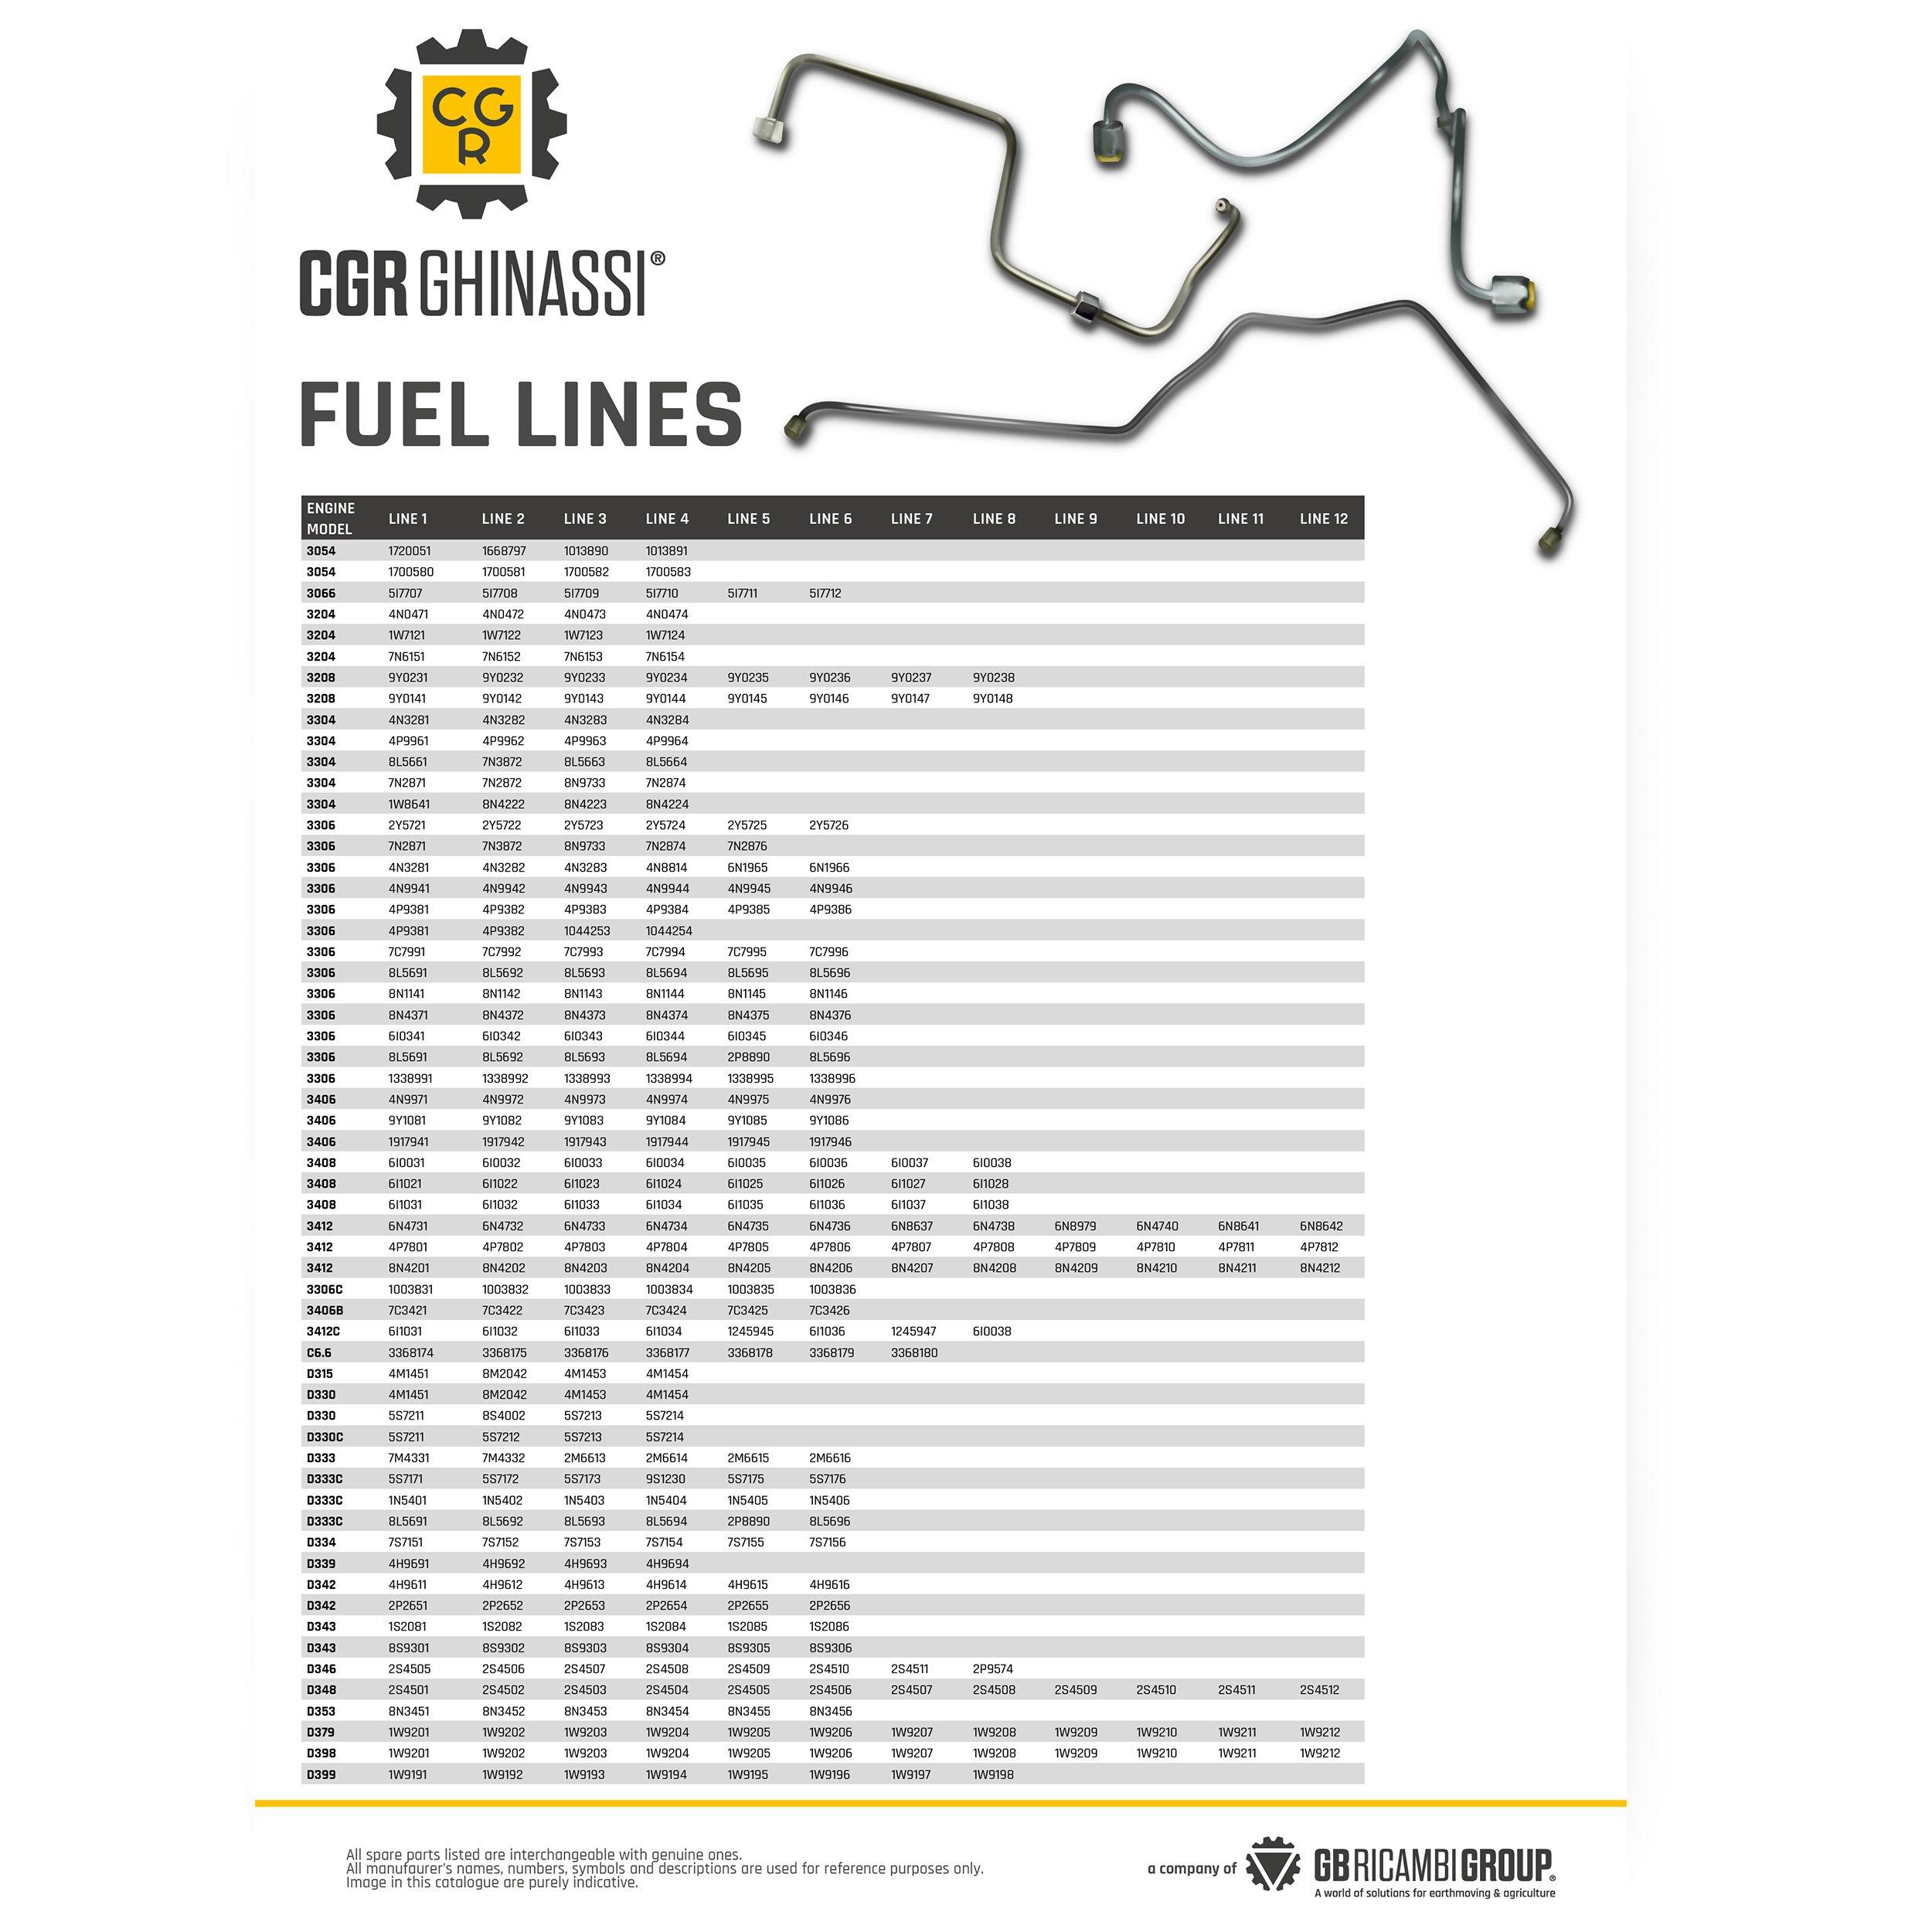 fuel lines mockup